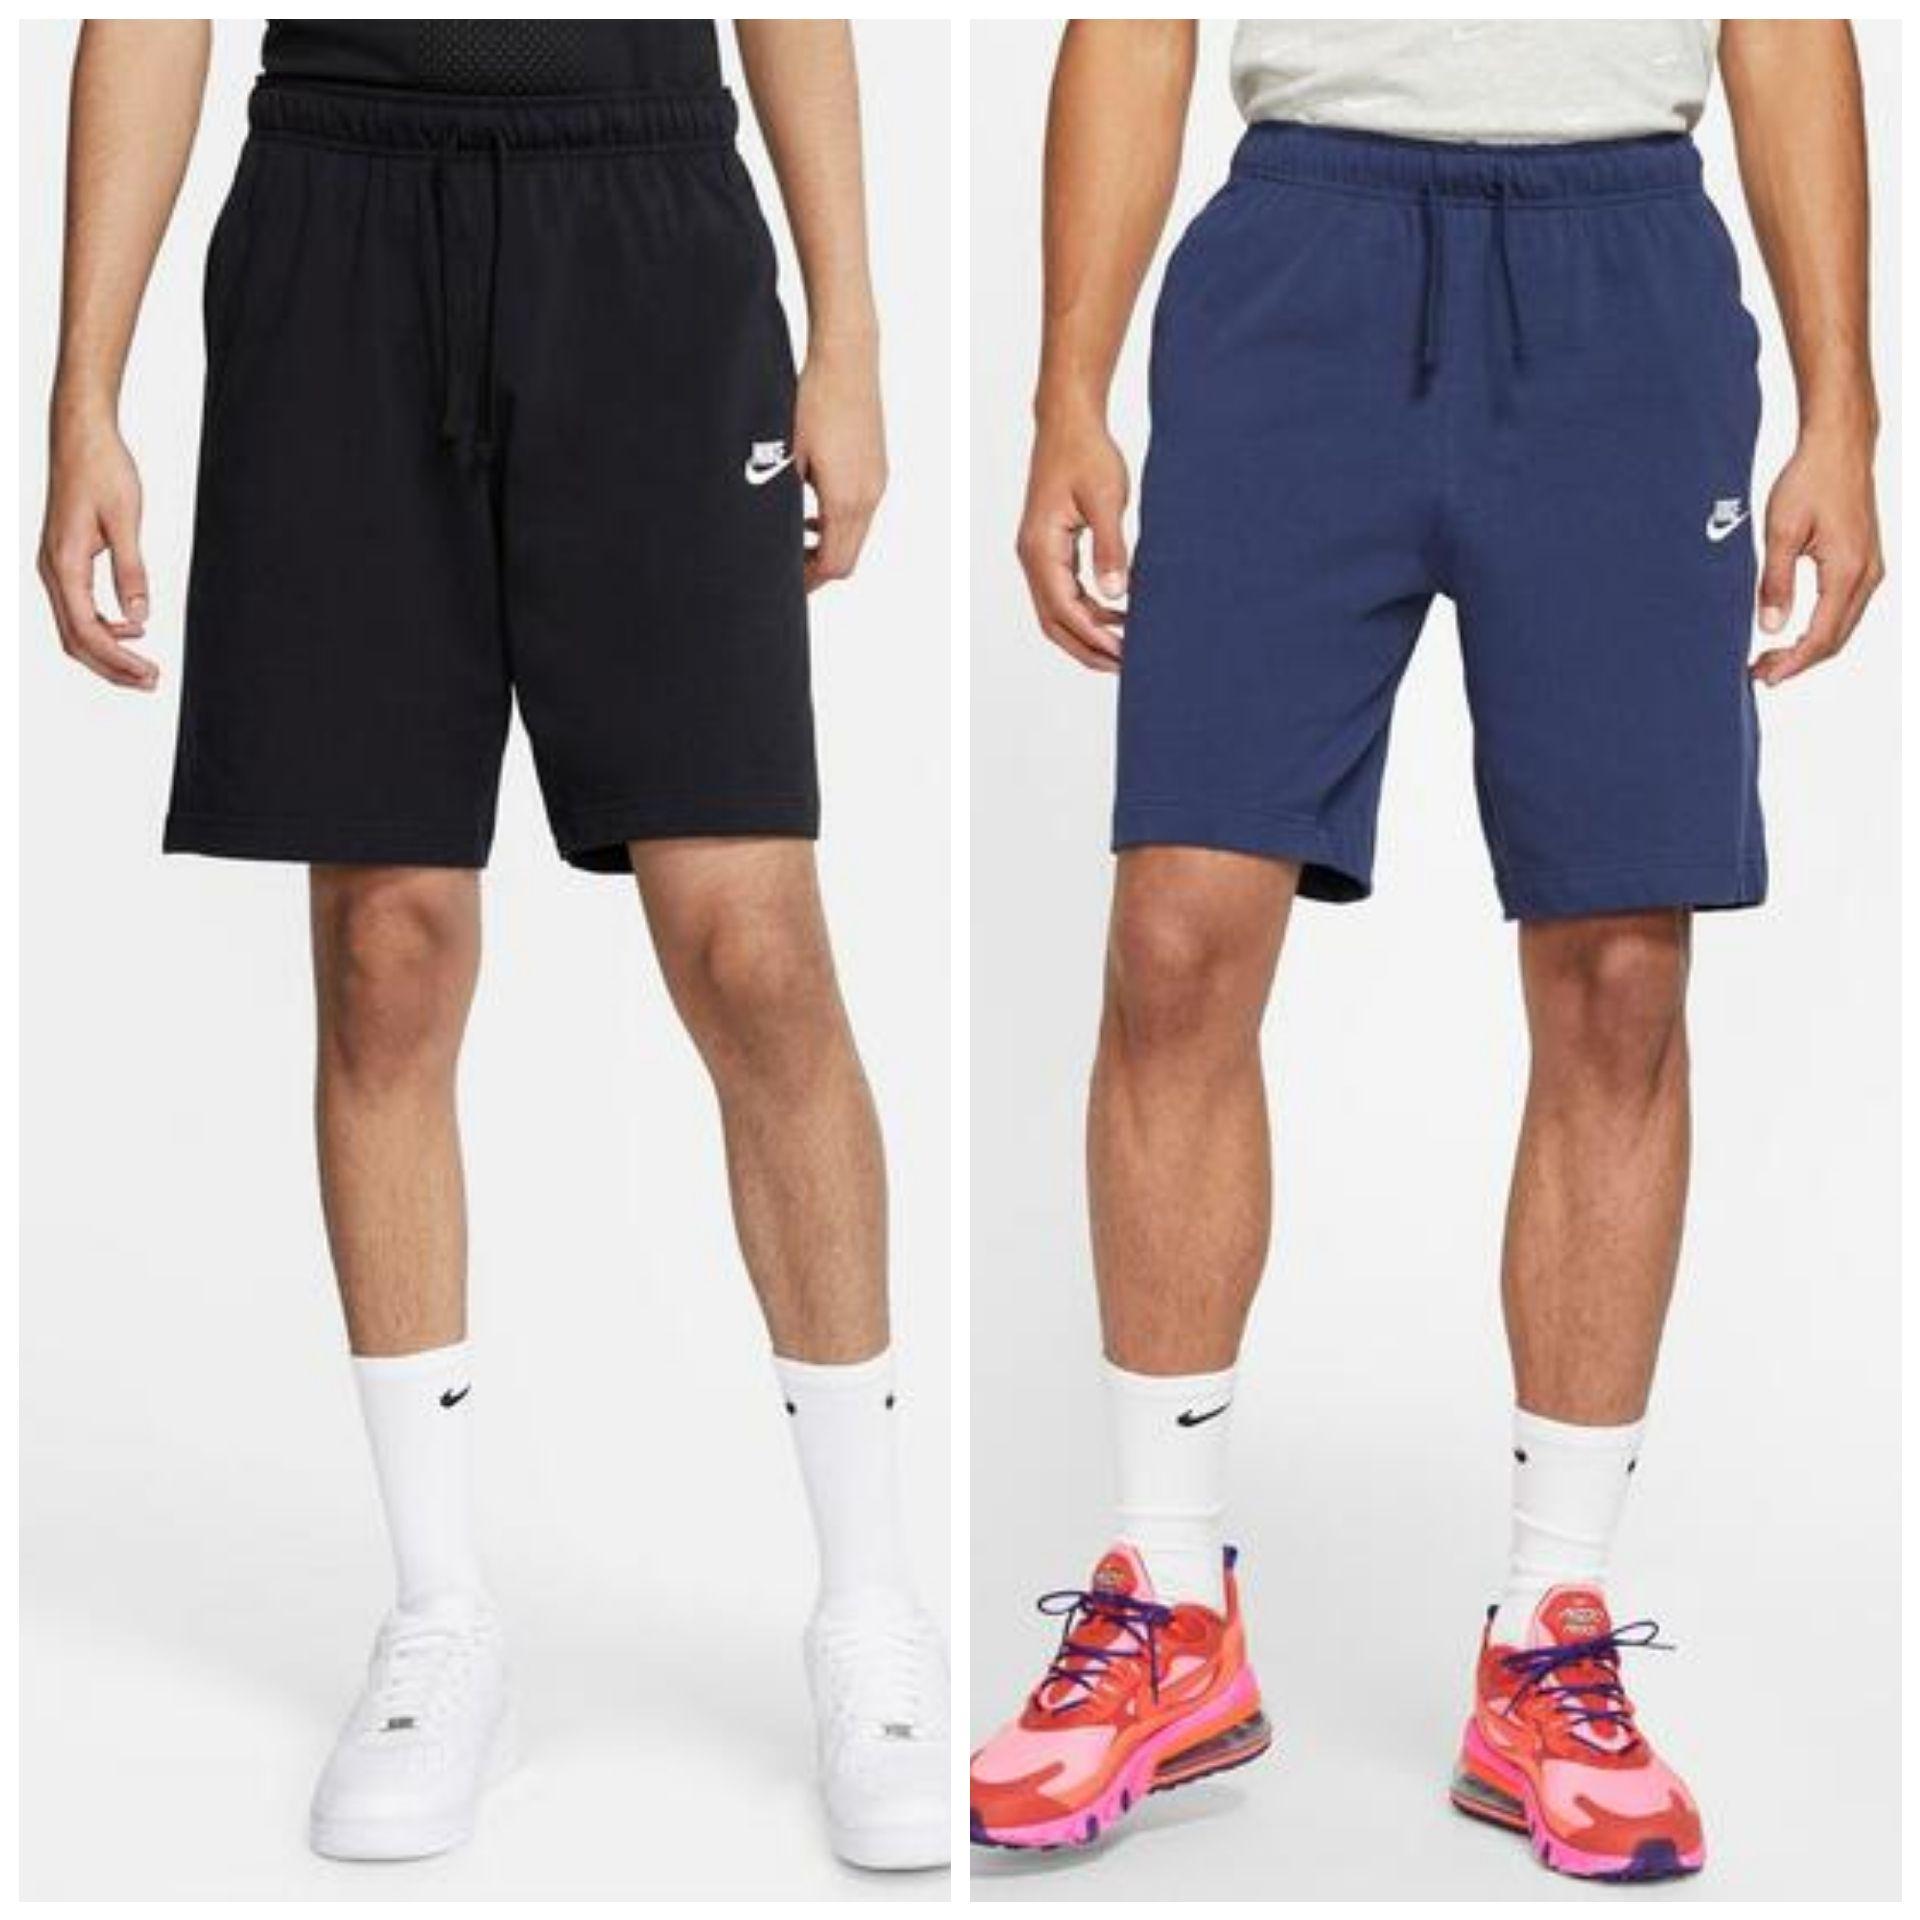 Pantalón corto Nike Club (2colores)